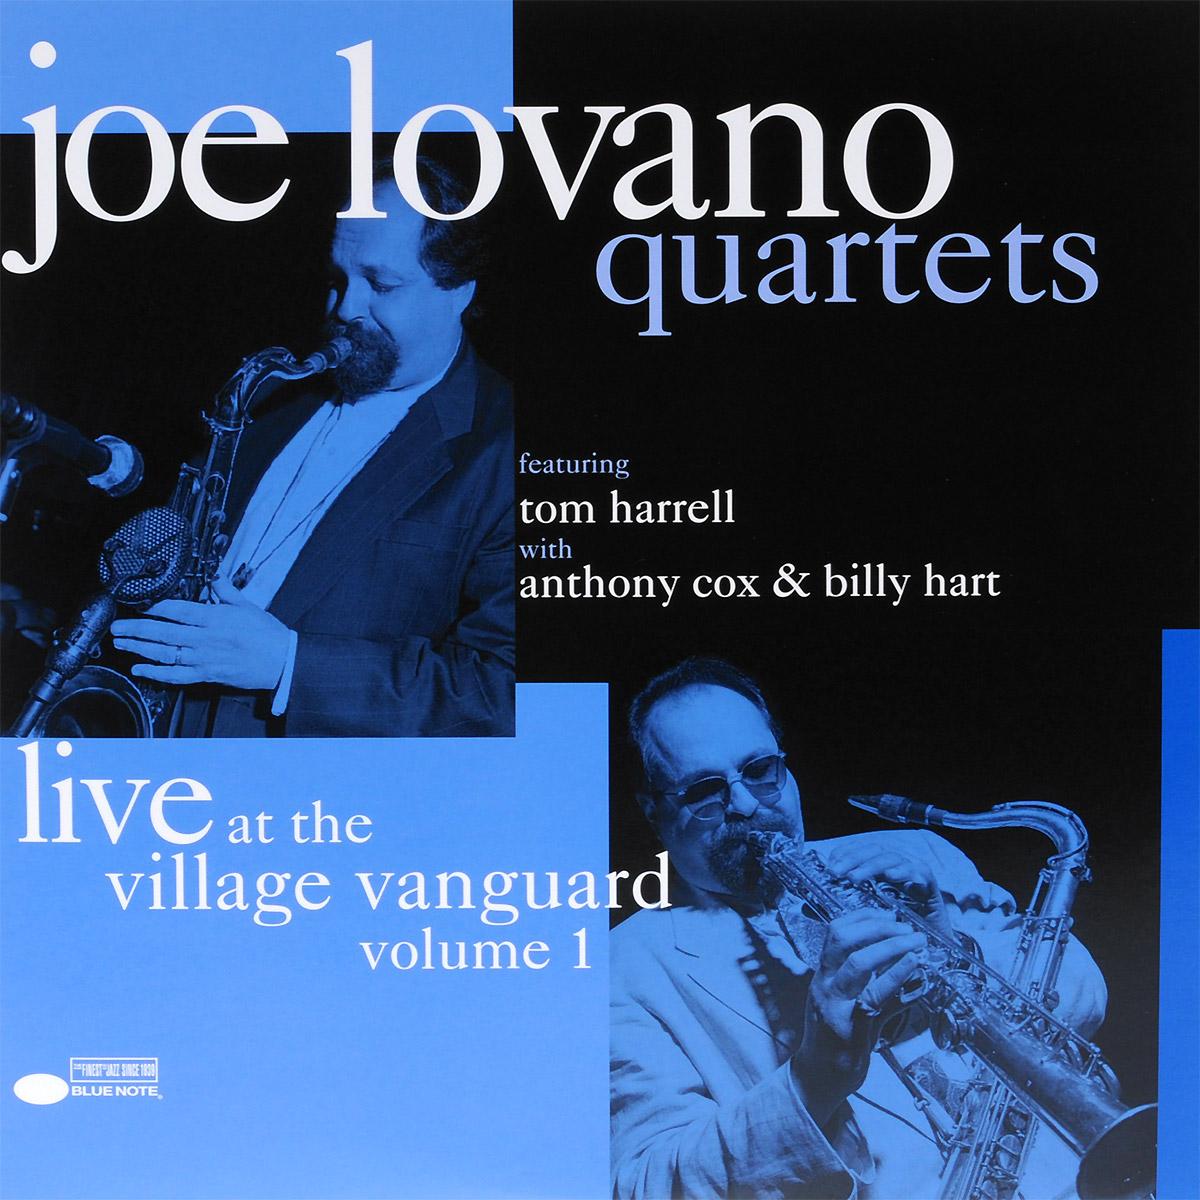 Joe Lovano Quartets Joe Lovano Quartets. Live At The Village Vanguard Volume 1 (2 LP) who who live at hyde park 3 lp